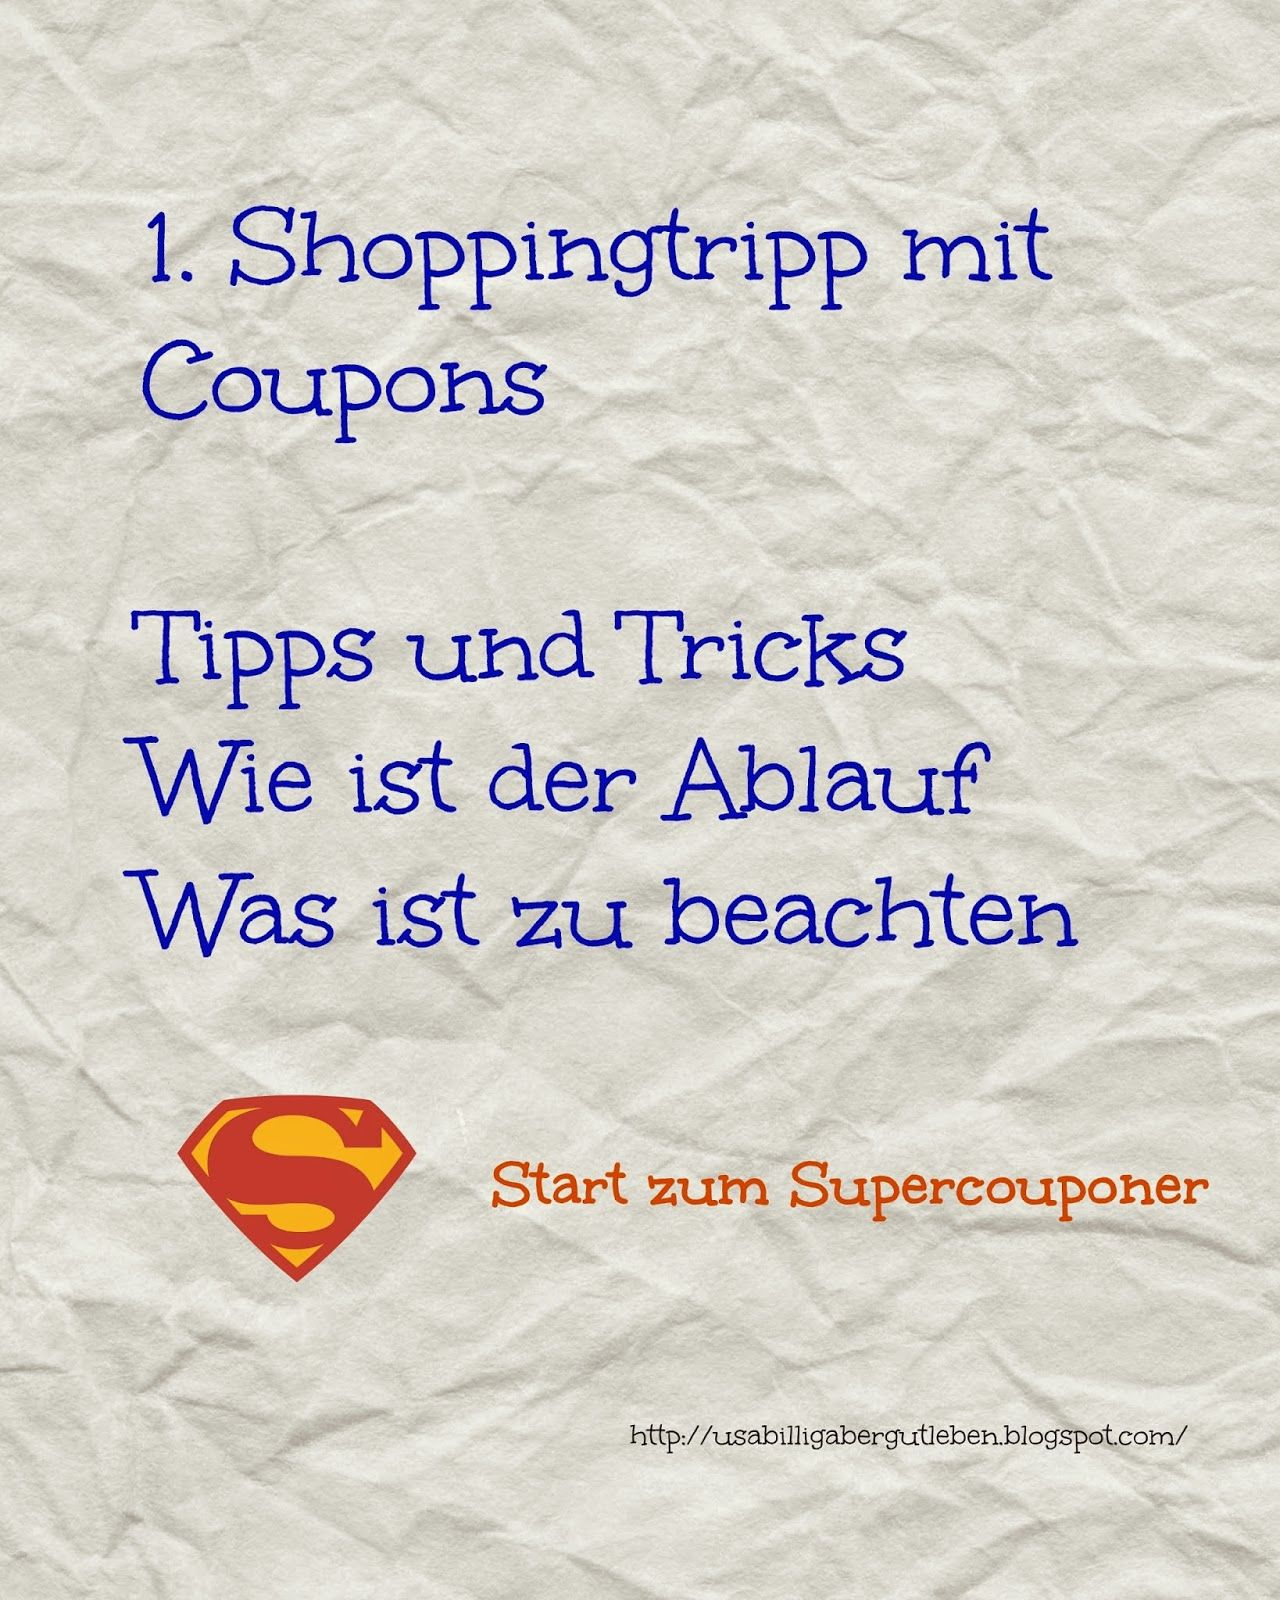 Der Erste Shoppingtrip Mit Coupons Couponing Tipps Und Tricks Couponing Fur Anfanger